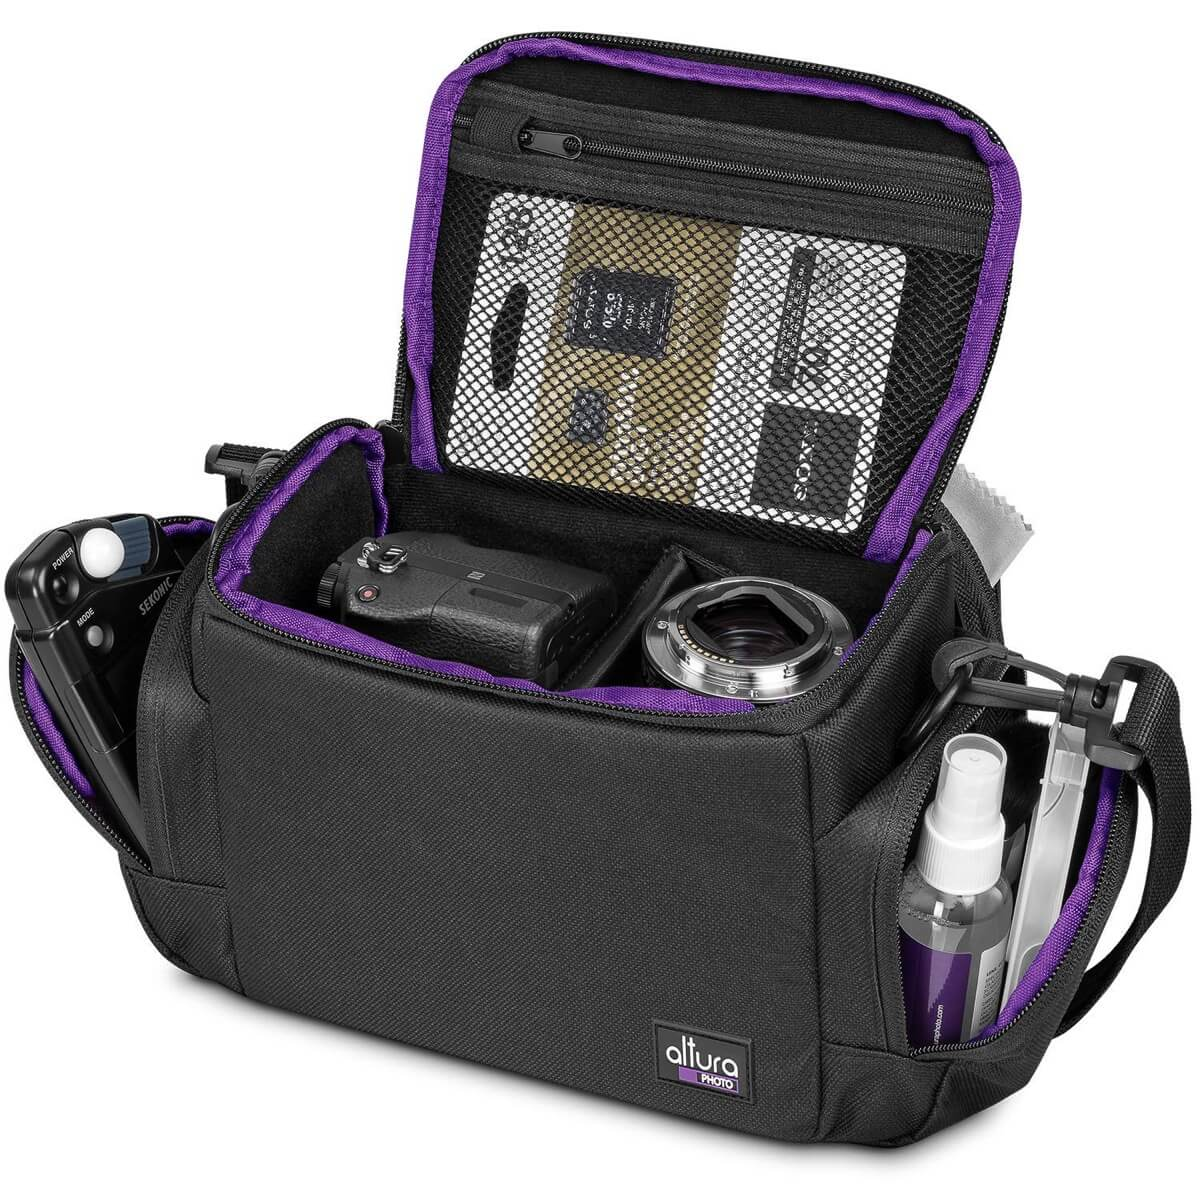 Medium Camera Bag Case by Altura Photo